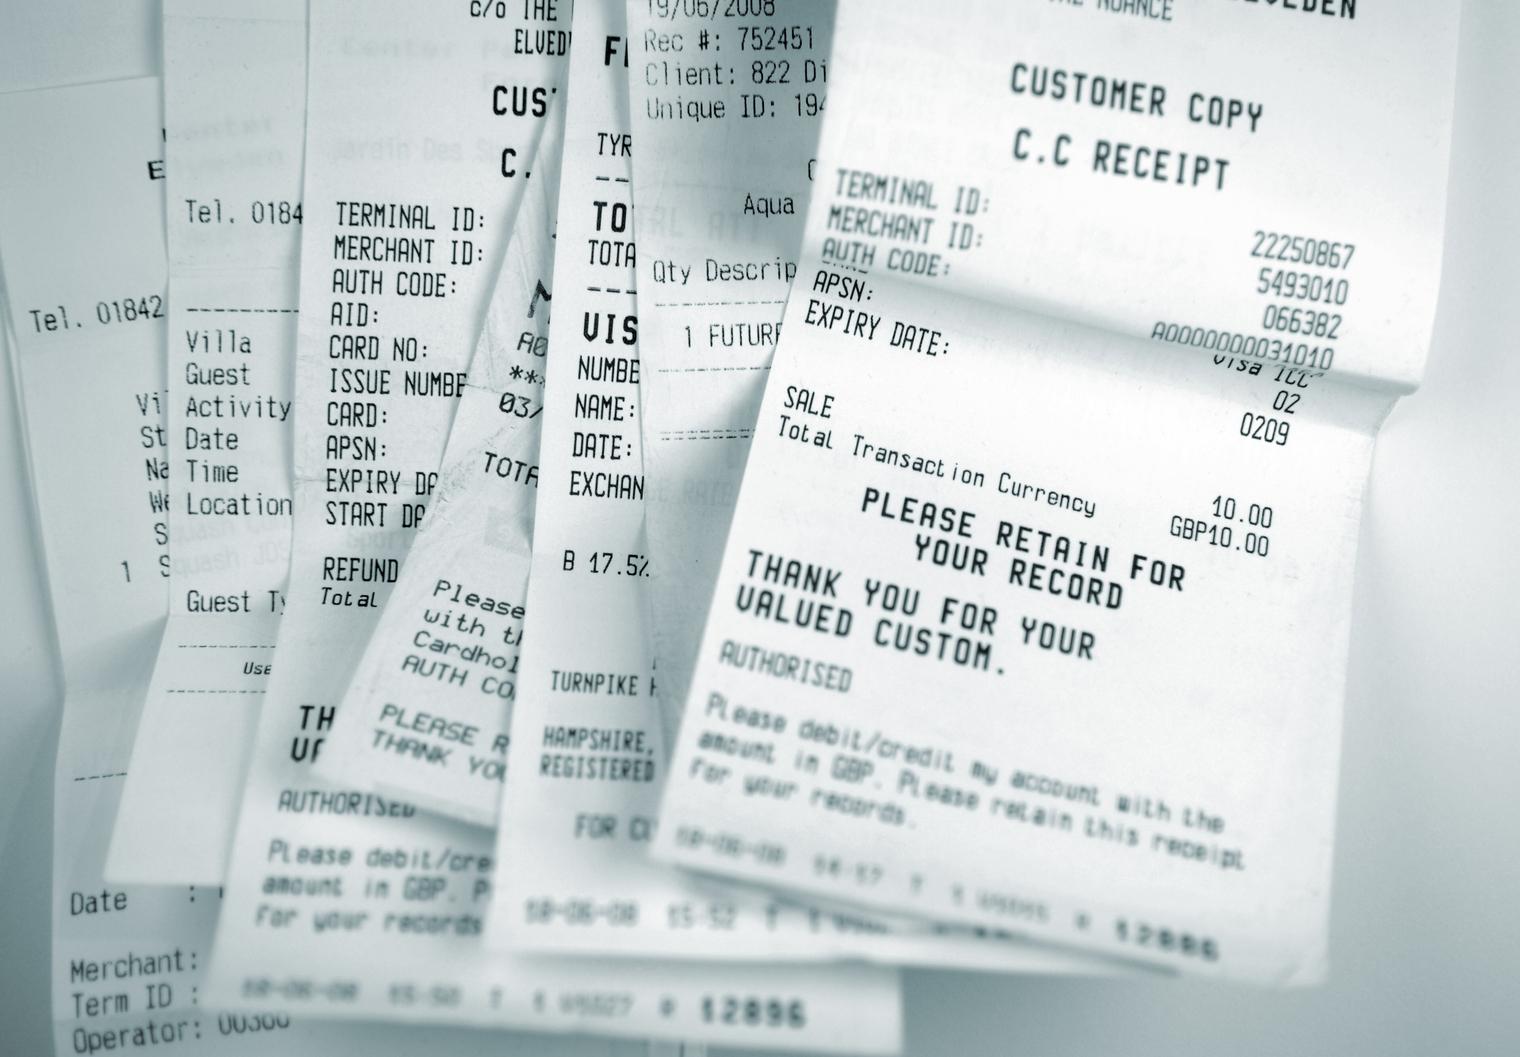 Pile of cash register receipts